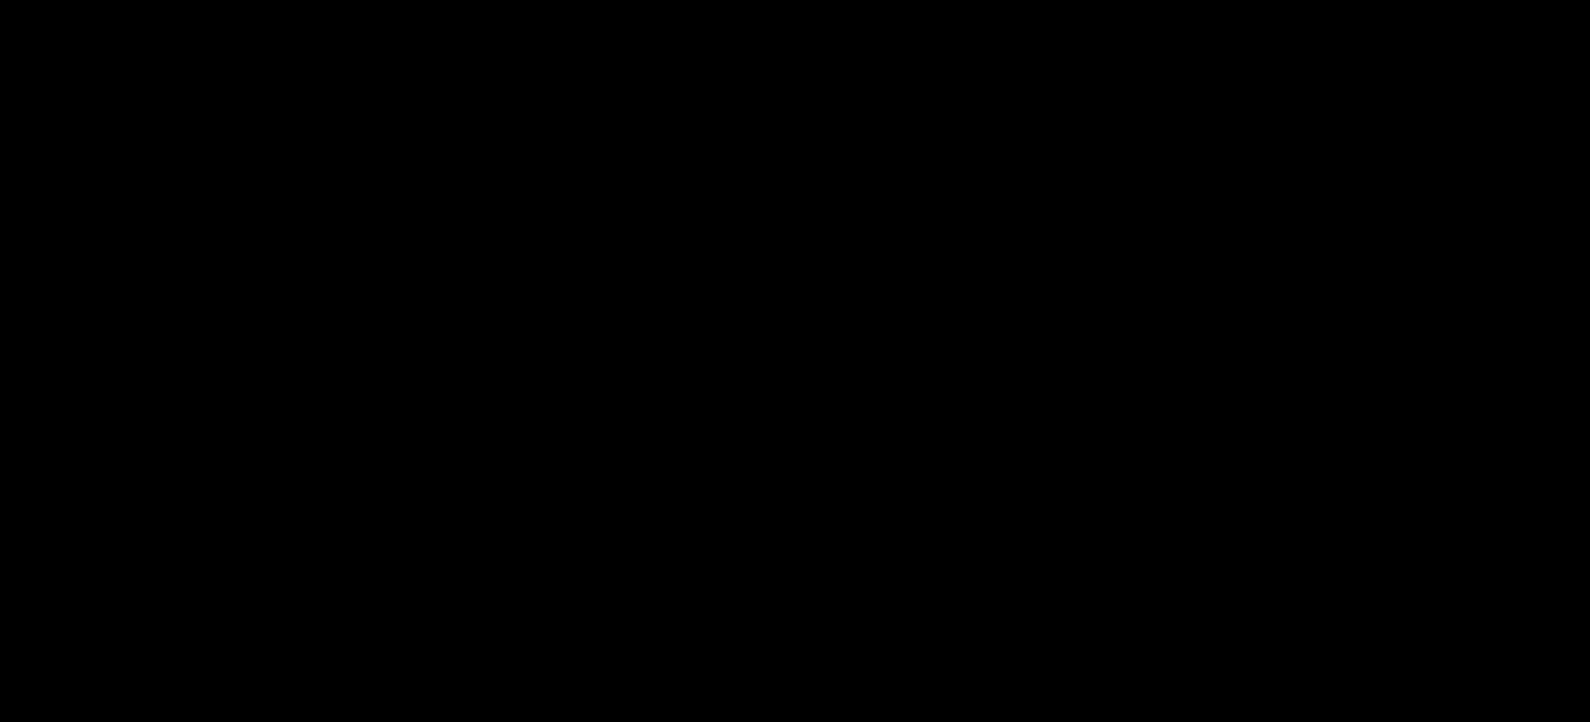 2015-08-01_004